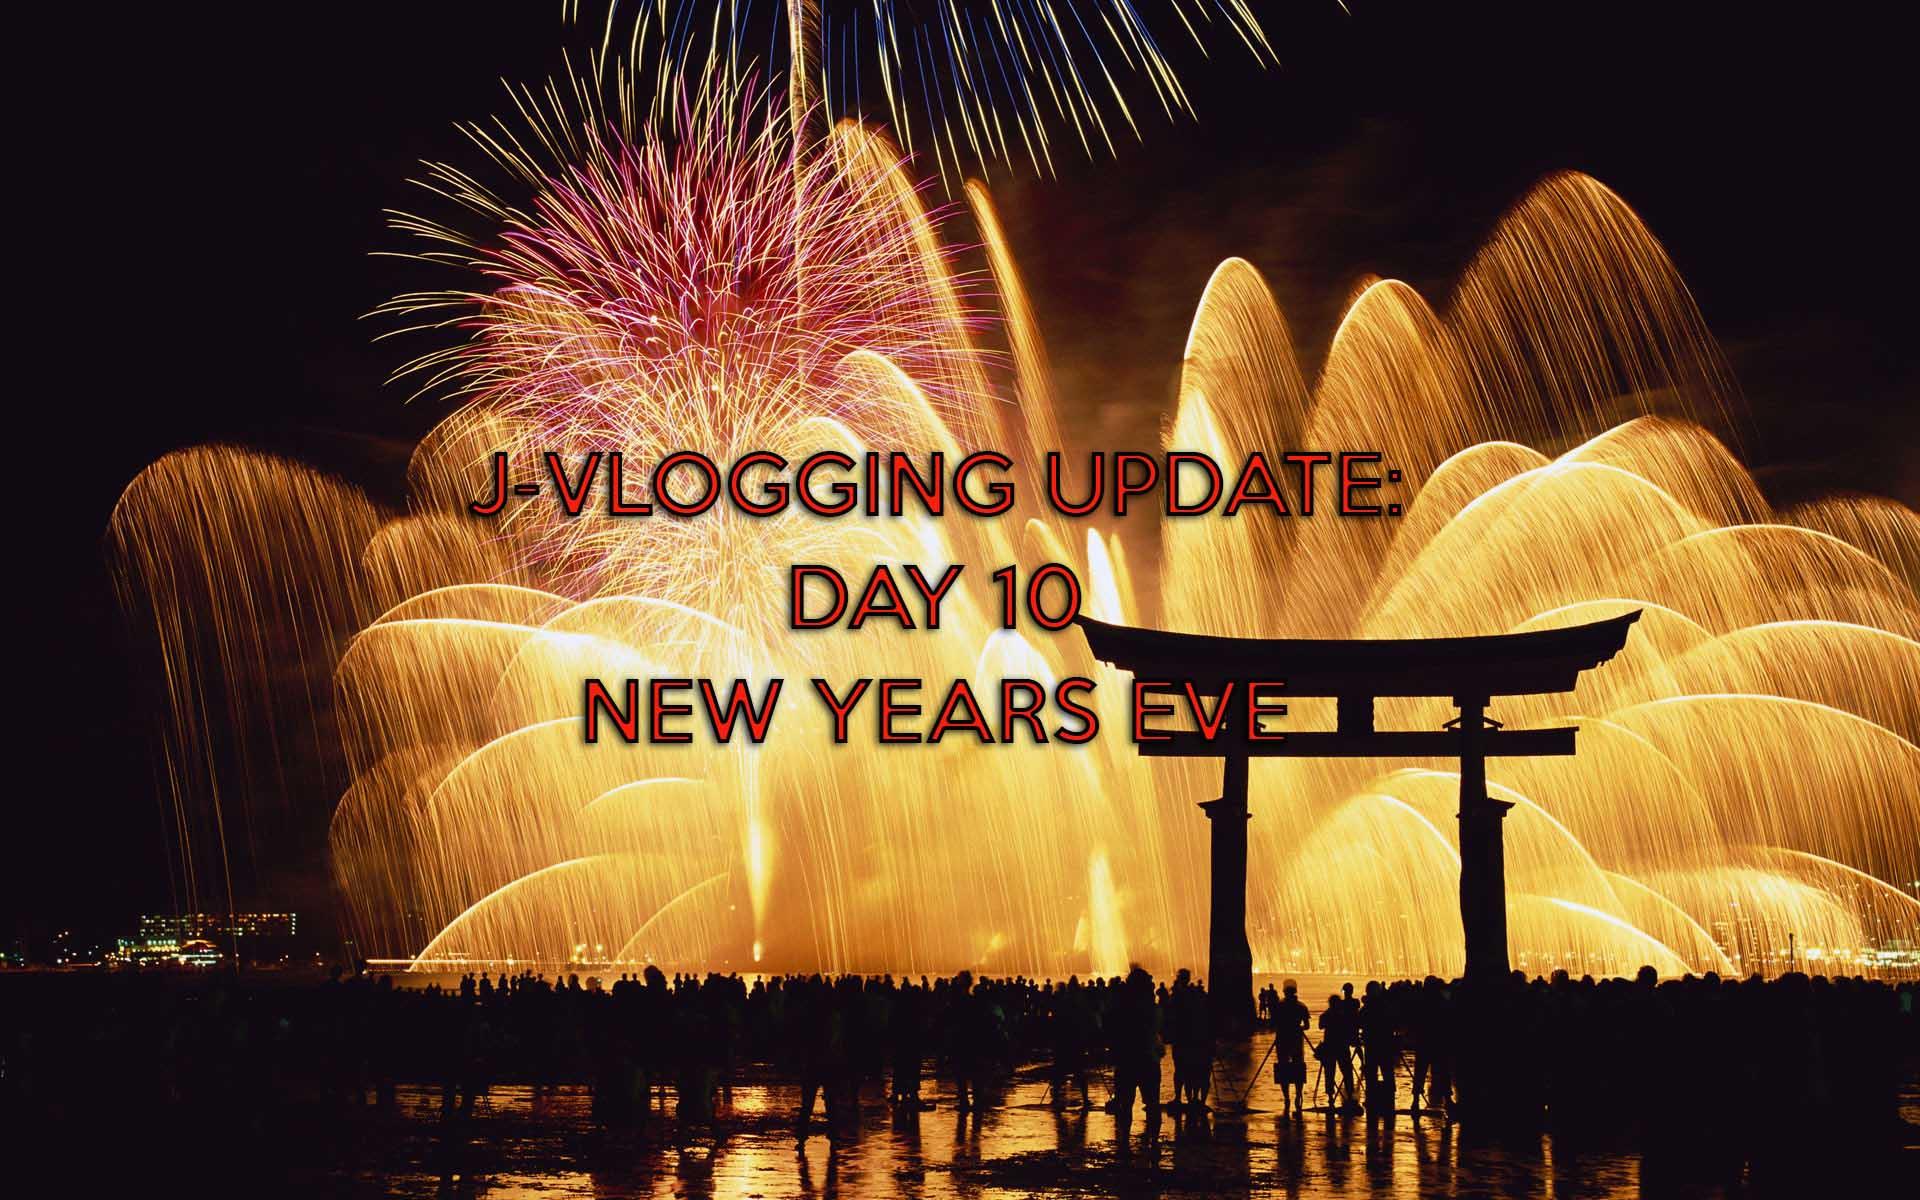 SHIBUYA & NEW YEAR'S EVE: J-VLOGGING DAY 10